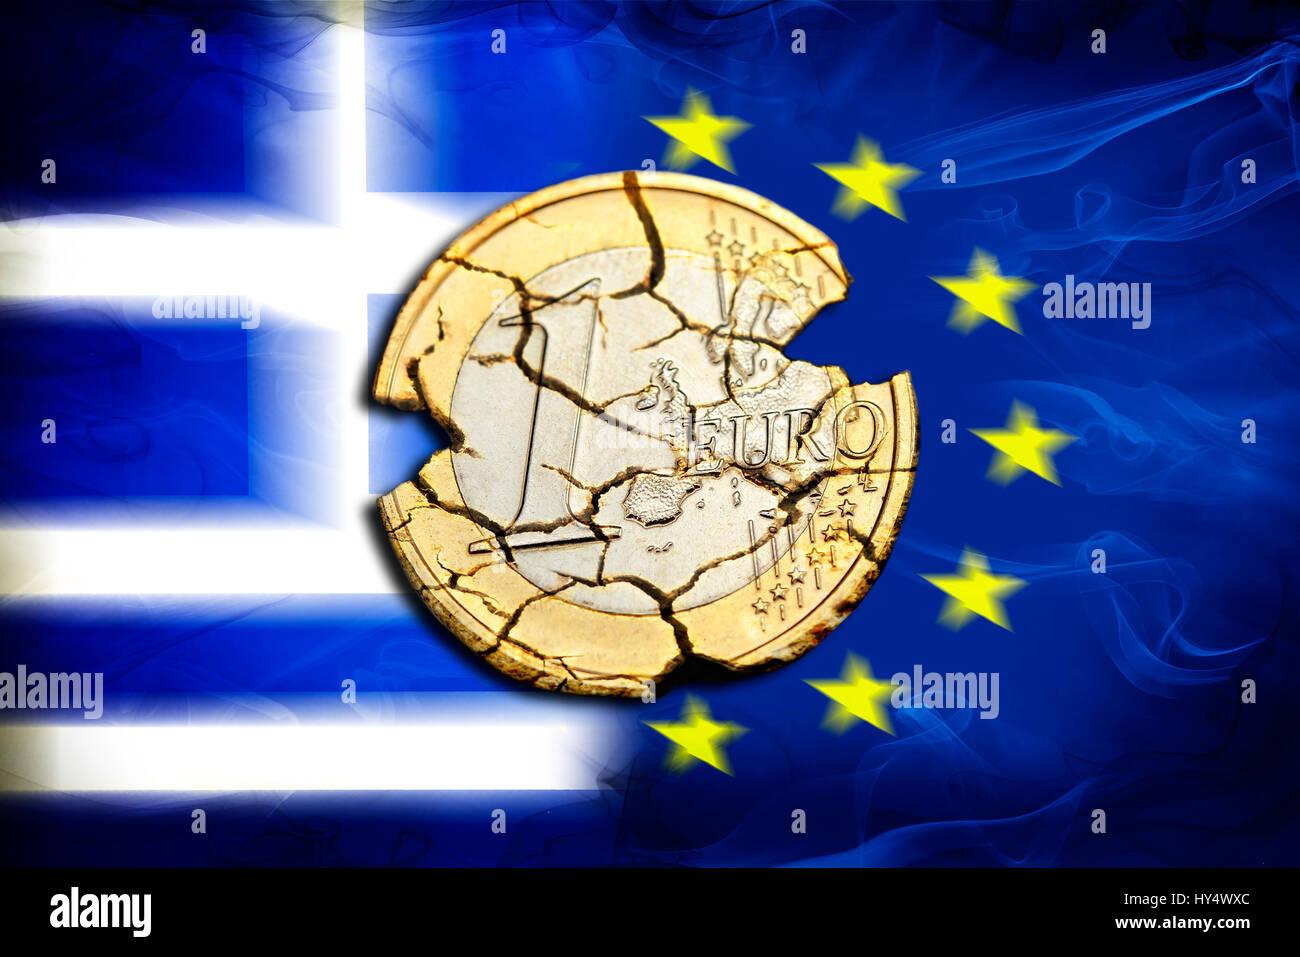 Euro-coin one with tears before Greece and EU flag, symbolic photo Grexit, Ein-Euro-Muenze mit Rissen vor Griechenland- und EU-Fahne, Symbolfoto Grexi Stock Photo